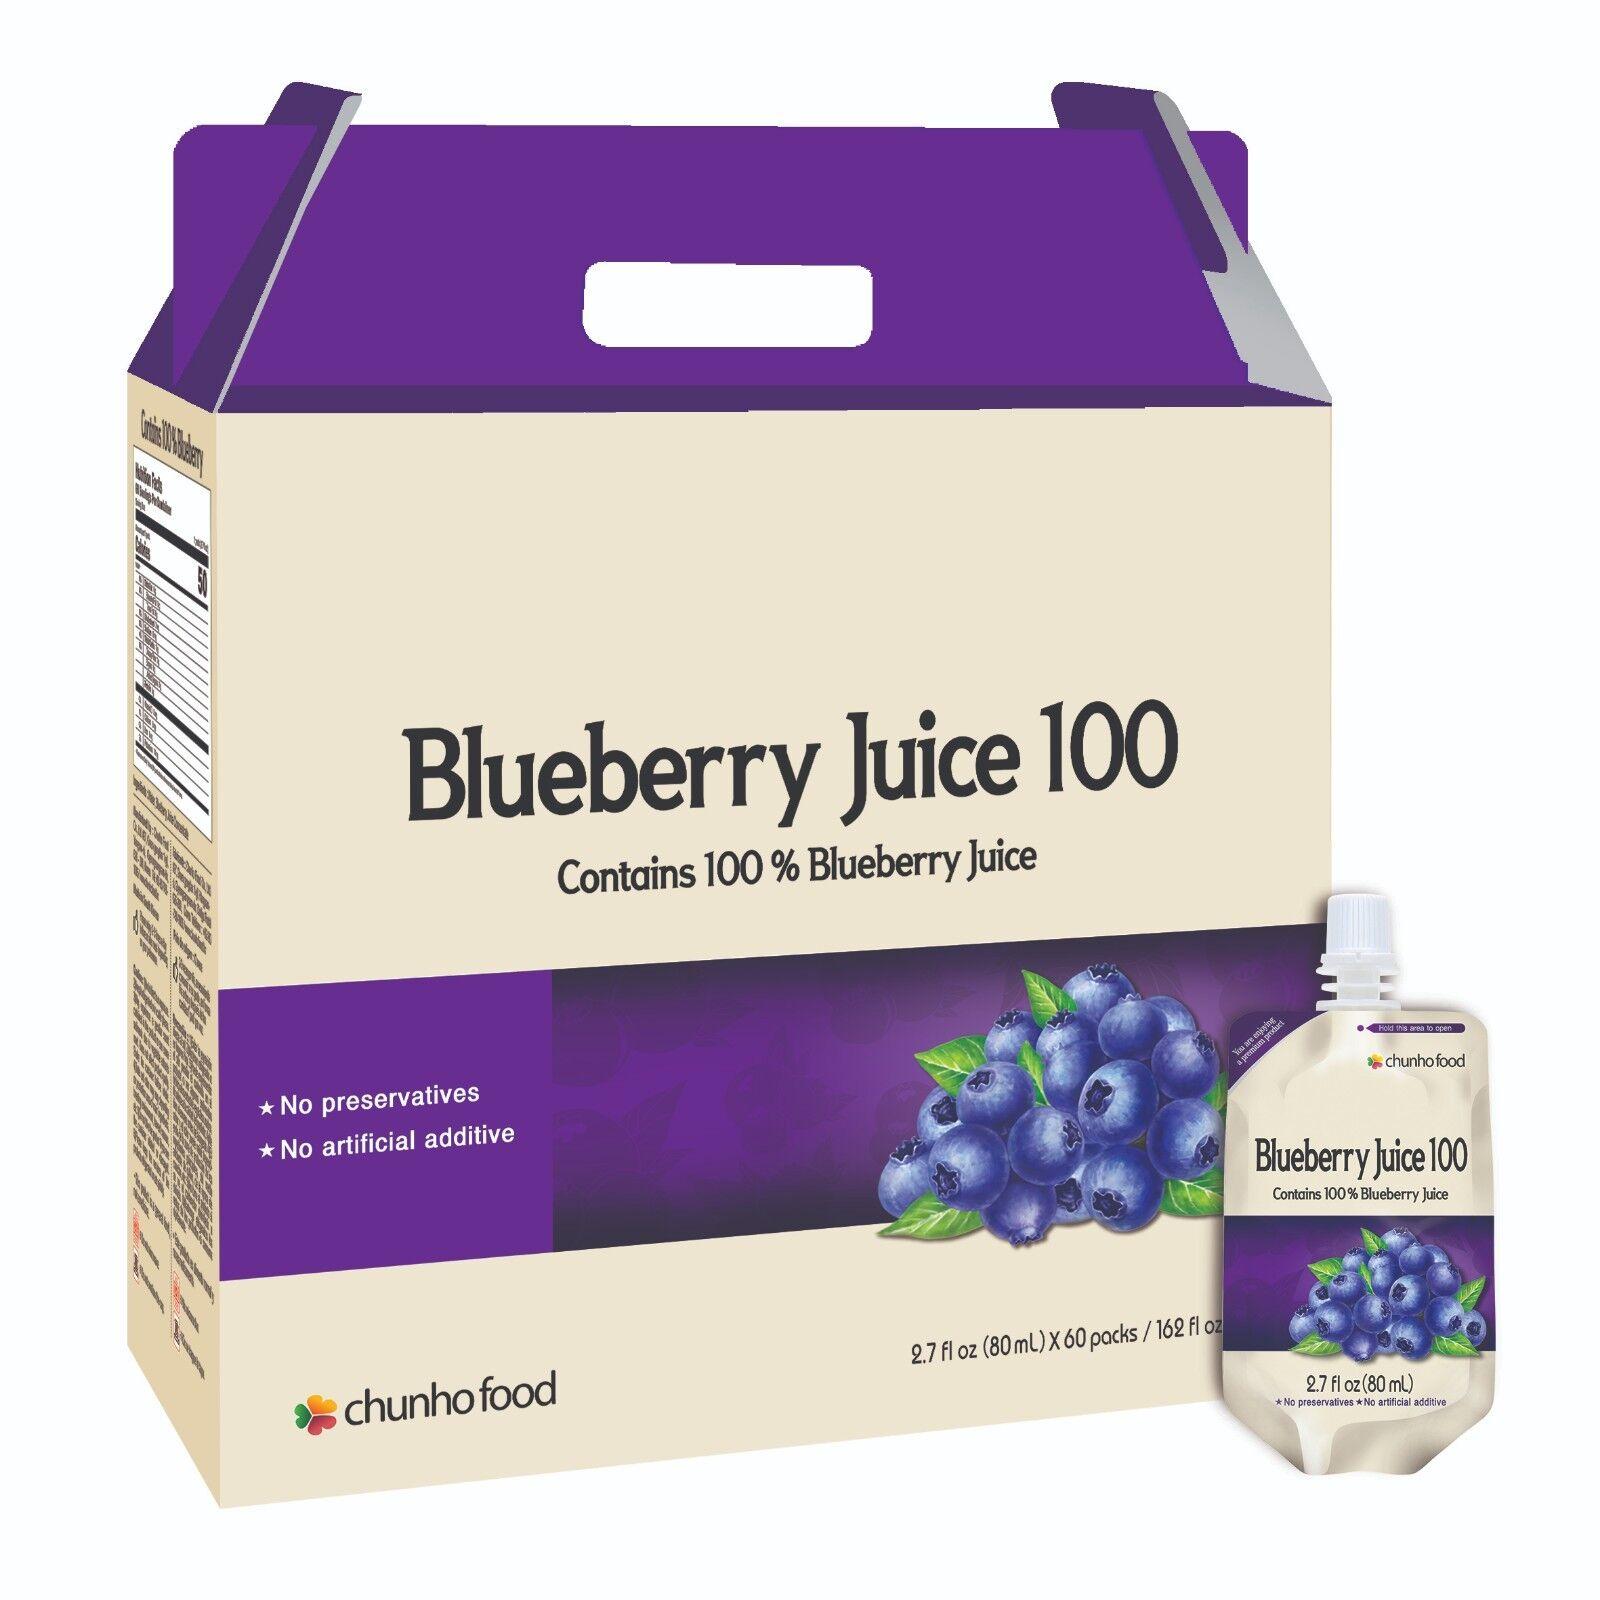 Chunho BlauBerry Juice 100 Relieve Eye Fatigue and Restore Eye Sight